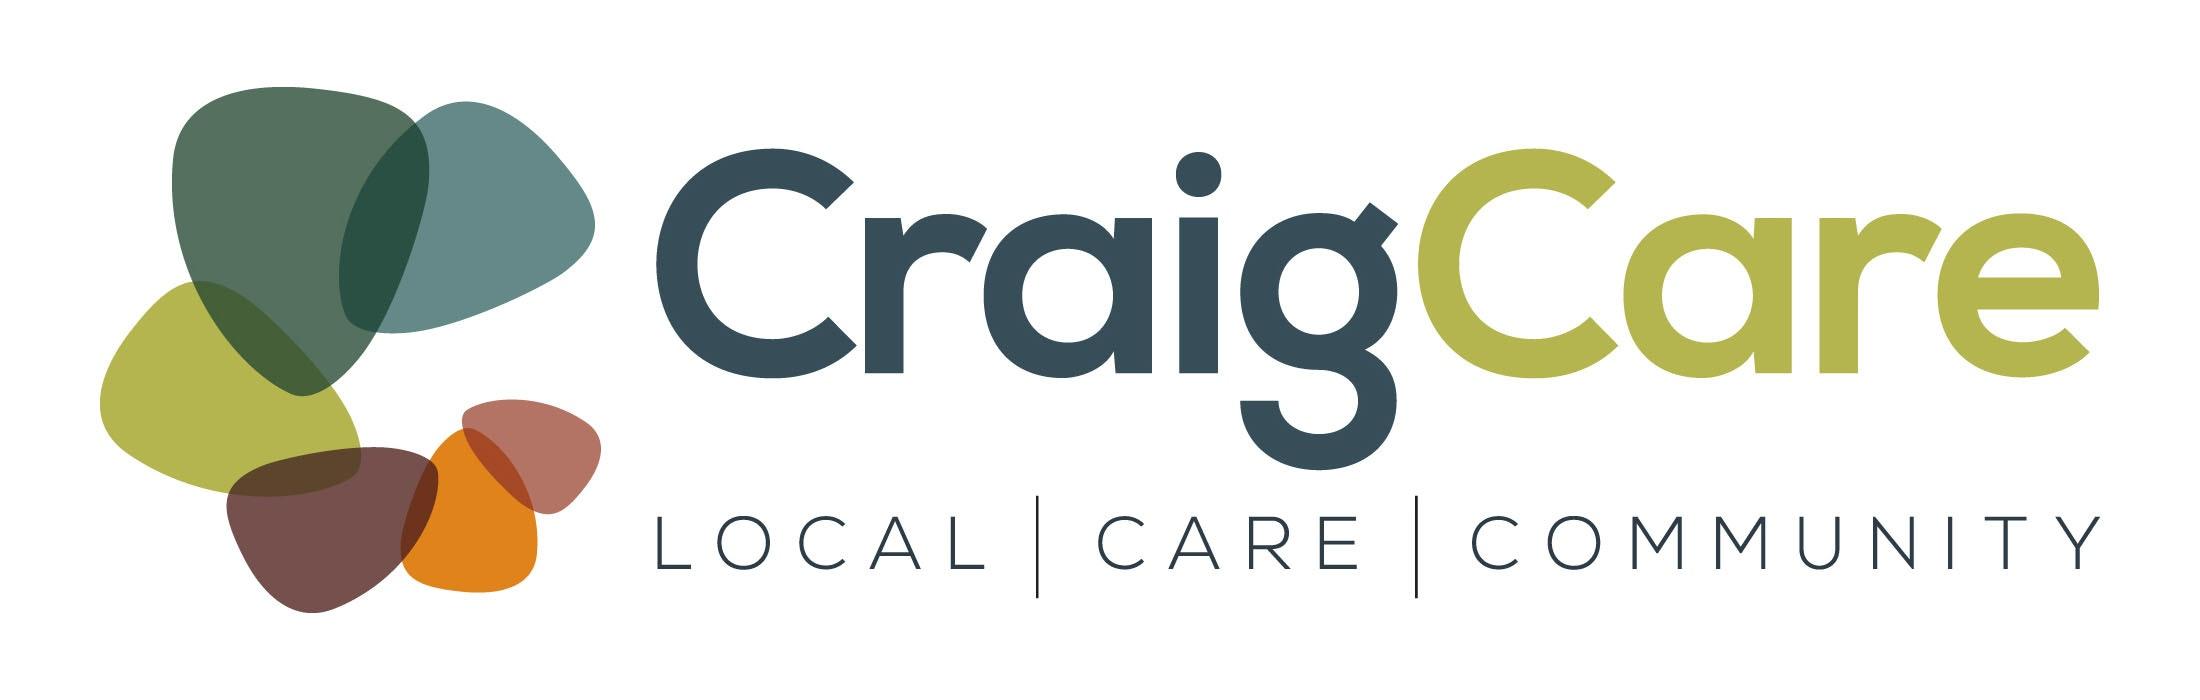 CraigCare Albany logo